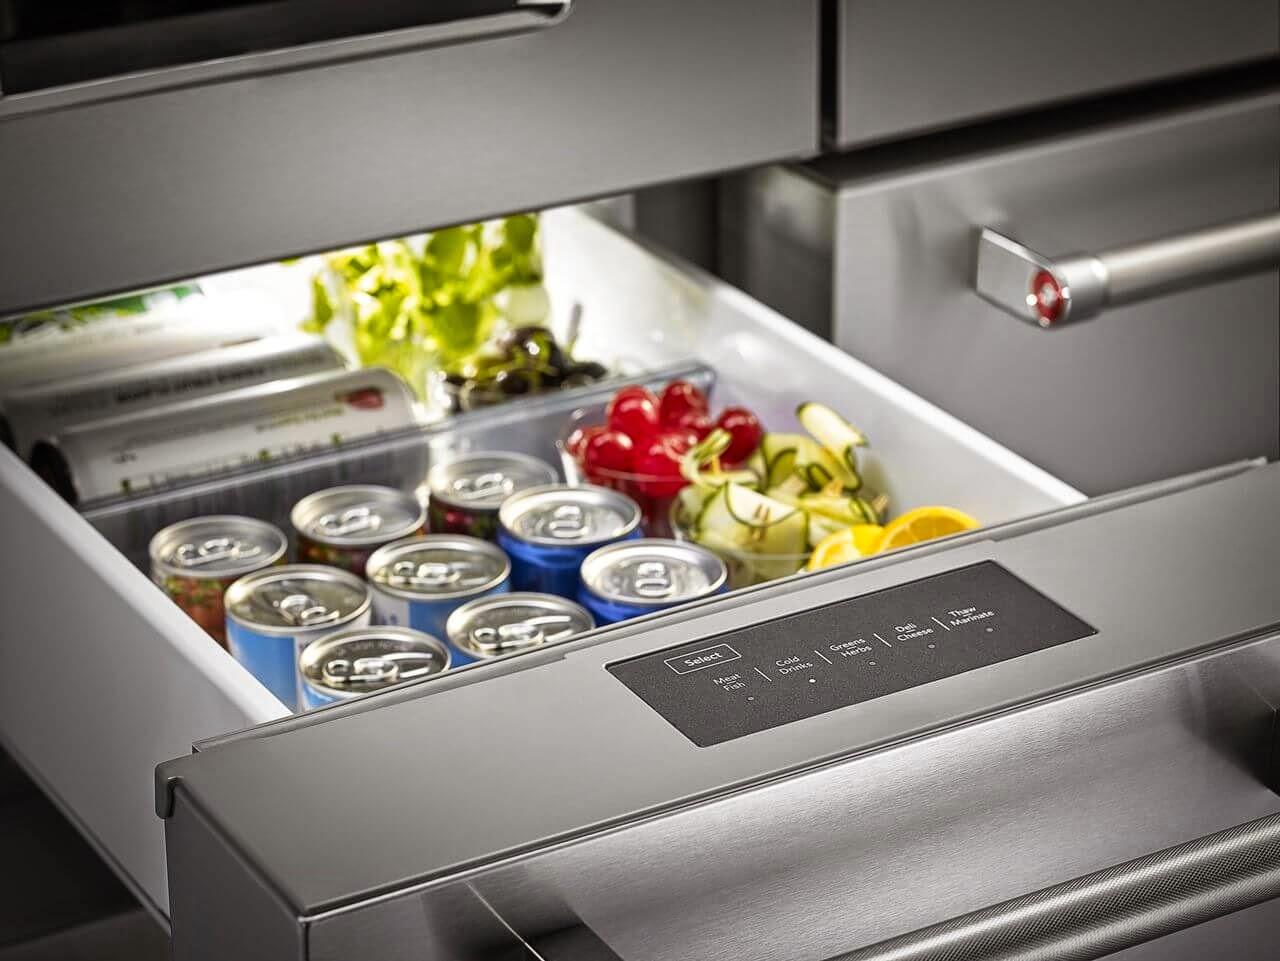 ALL NEW 2015 5 Door KitchenAid Refrigerator